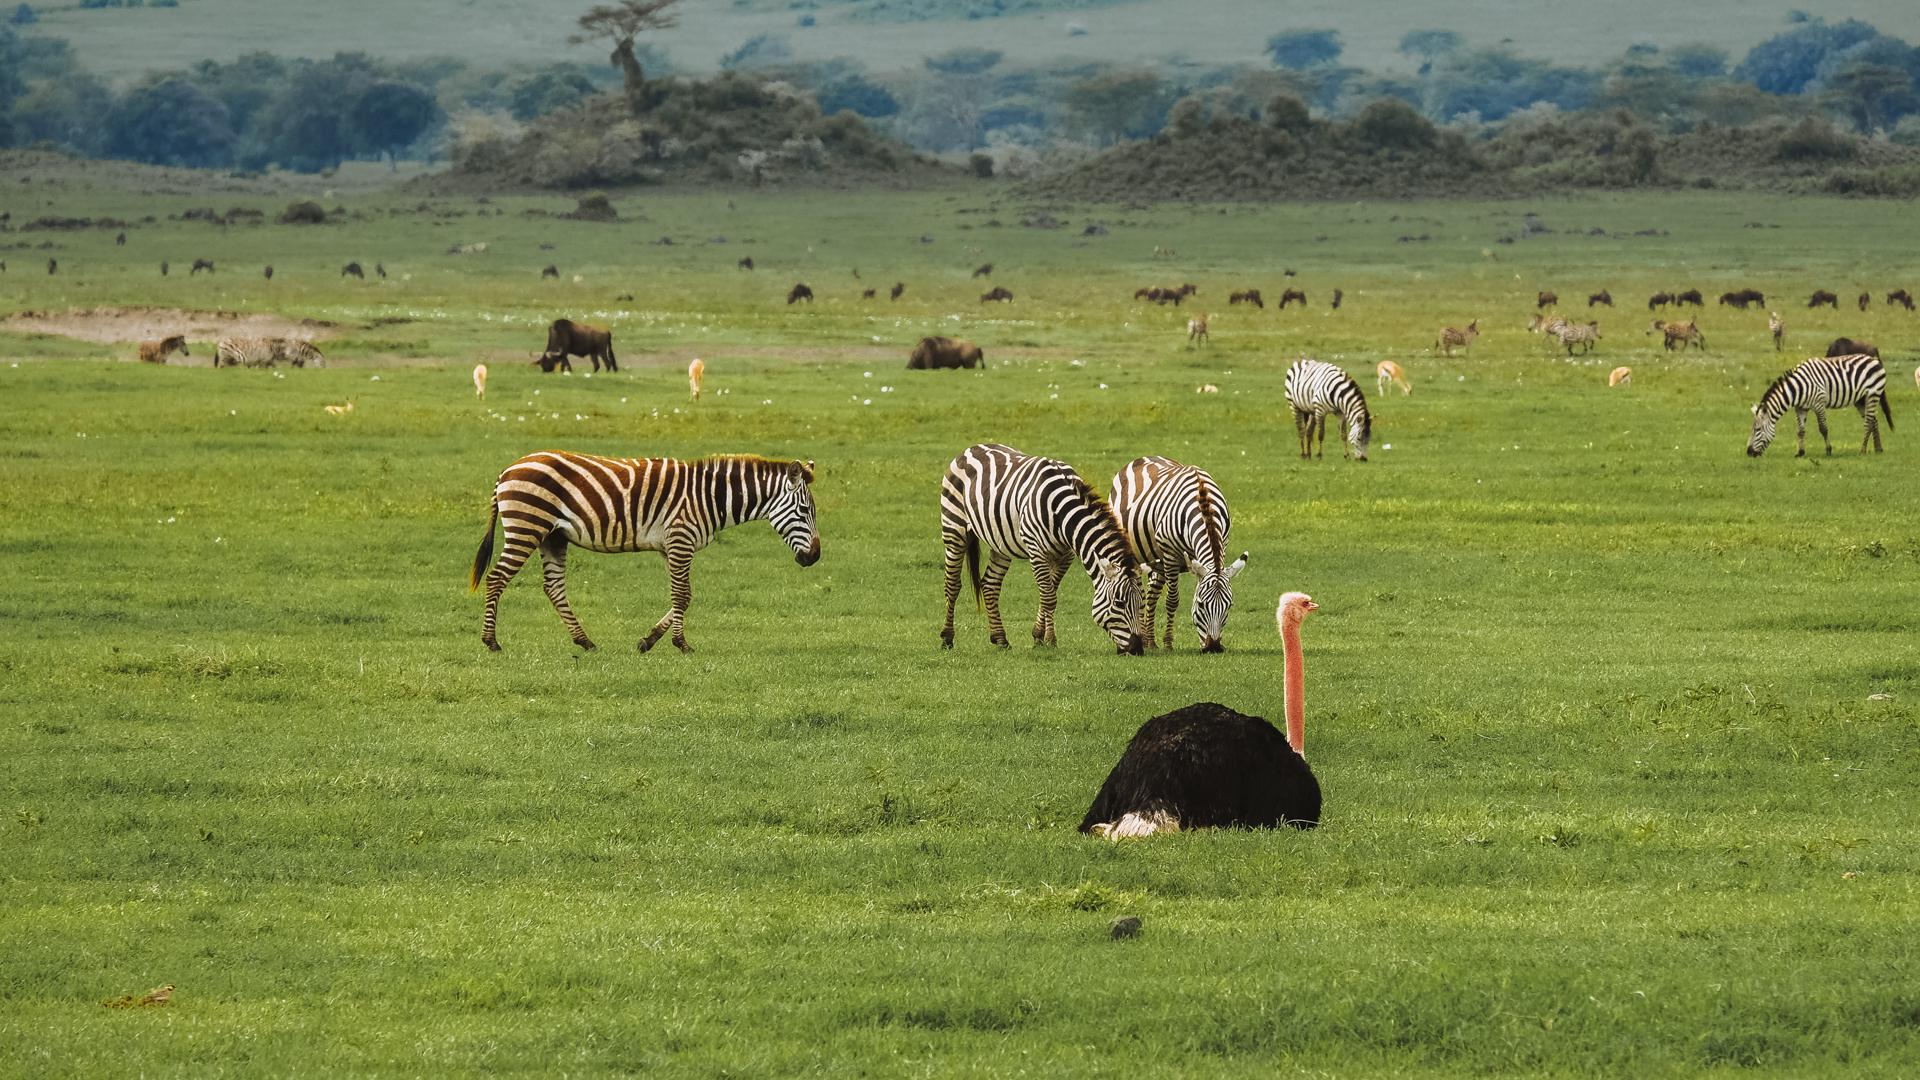 An ostrich with zebras